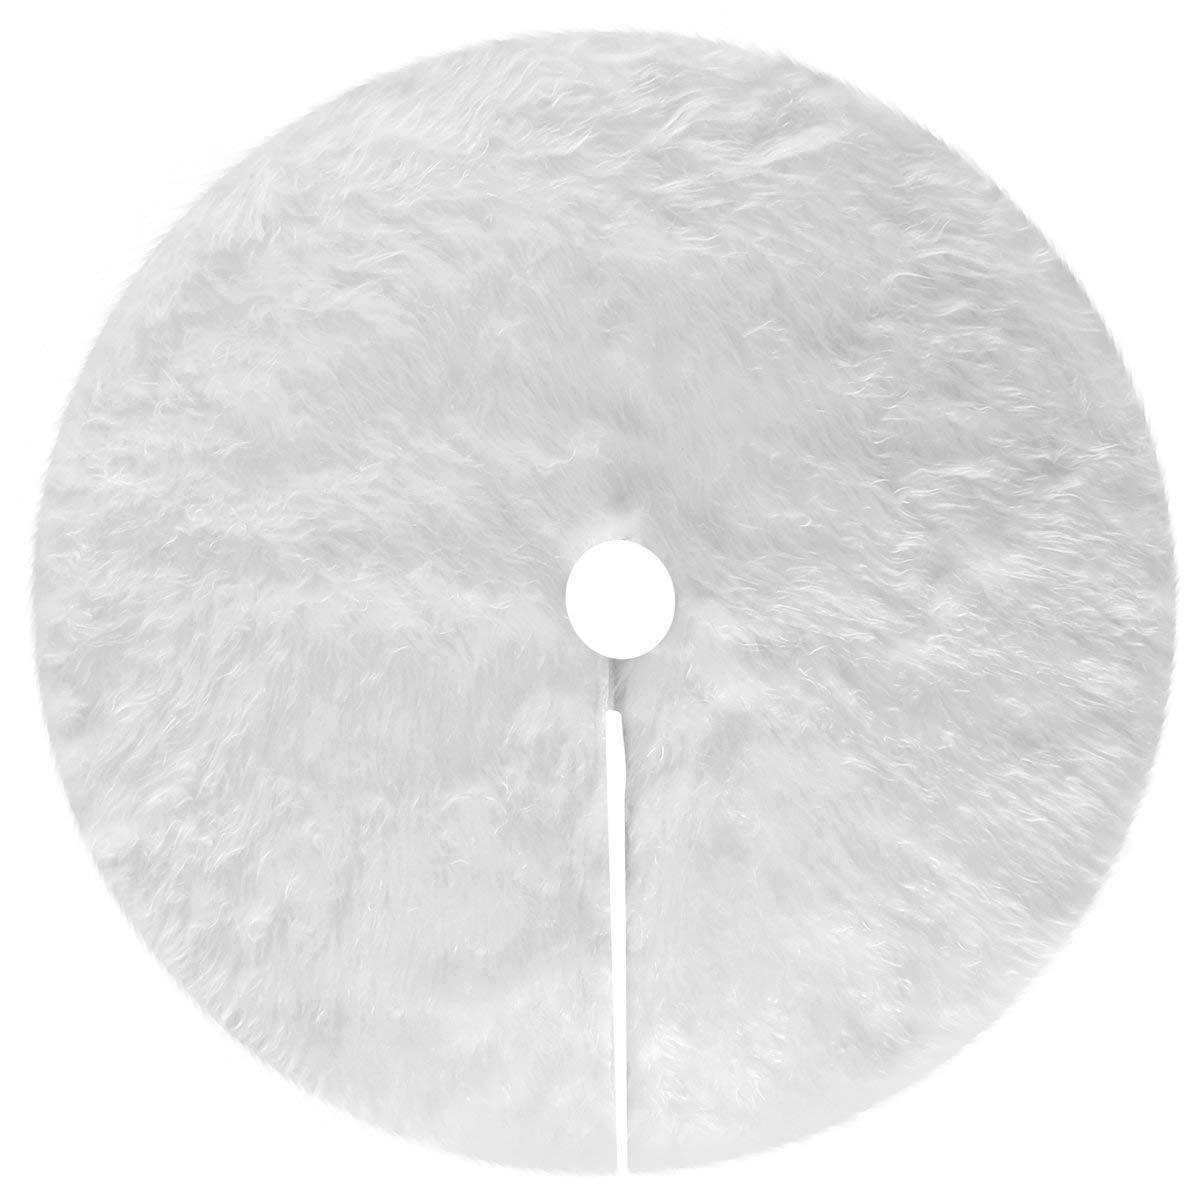 iWerDon gonne di Albero di Natale Bianco Neve Albero Gonna per Decorazioni di Natale (76, 2 cm) 2cm)